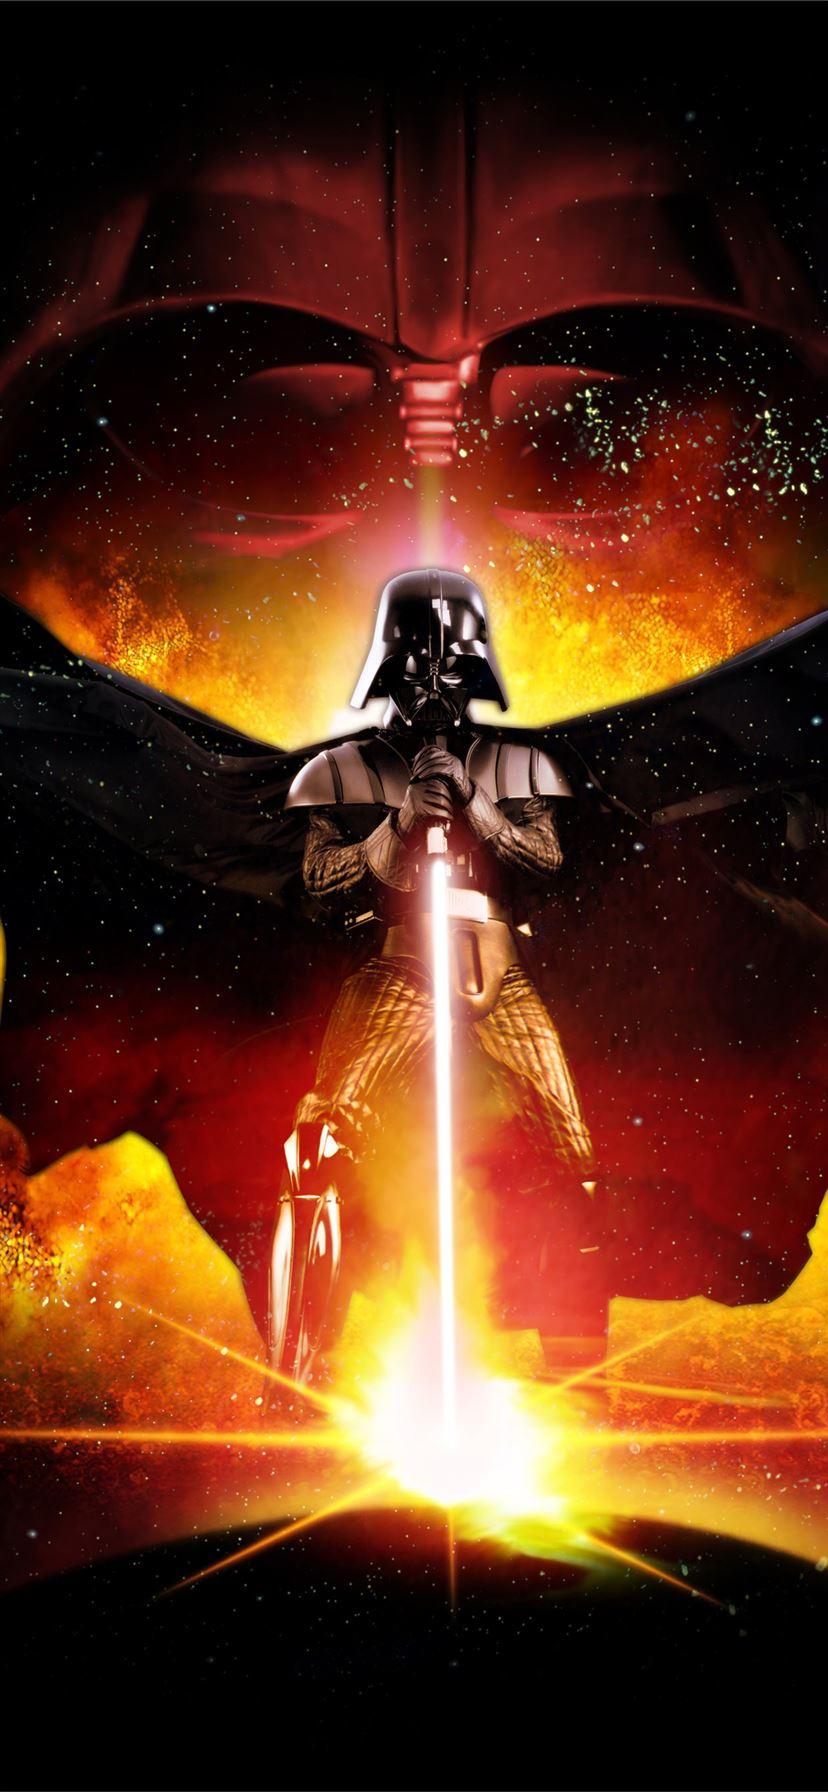 darth vader star wars poster 4k iPhone X Wallpapers Free Download